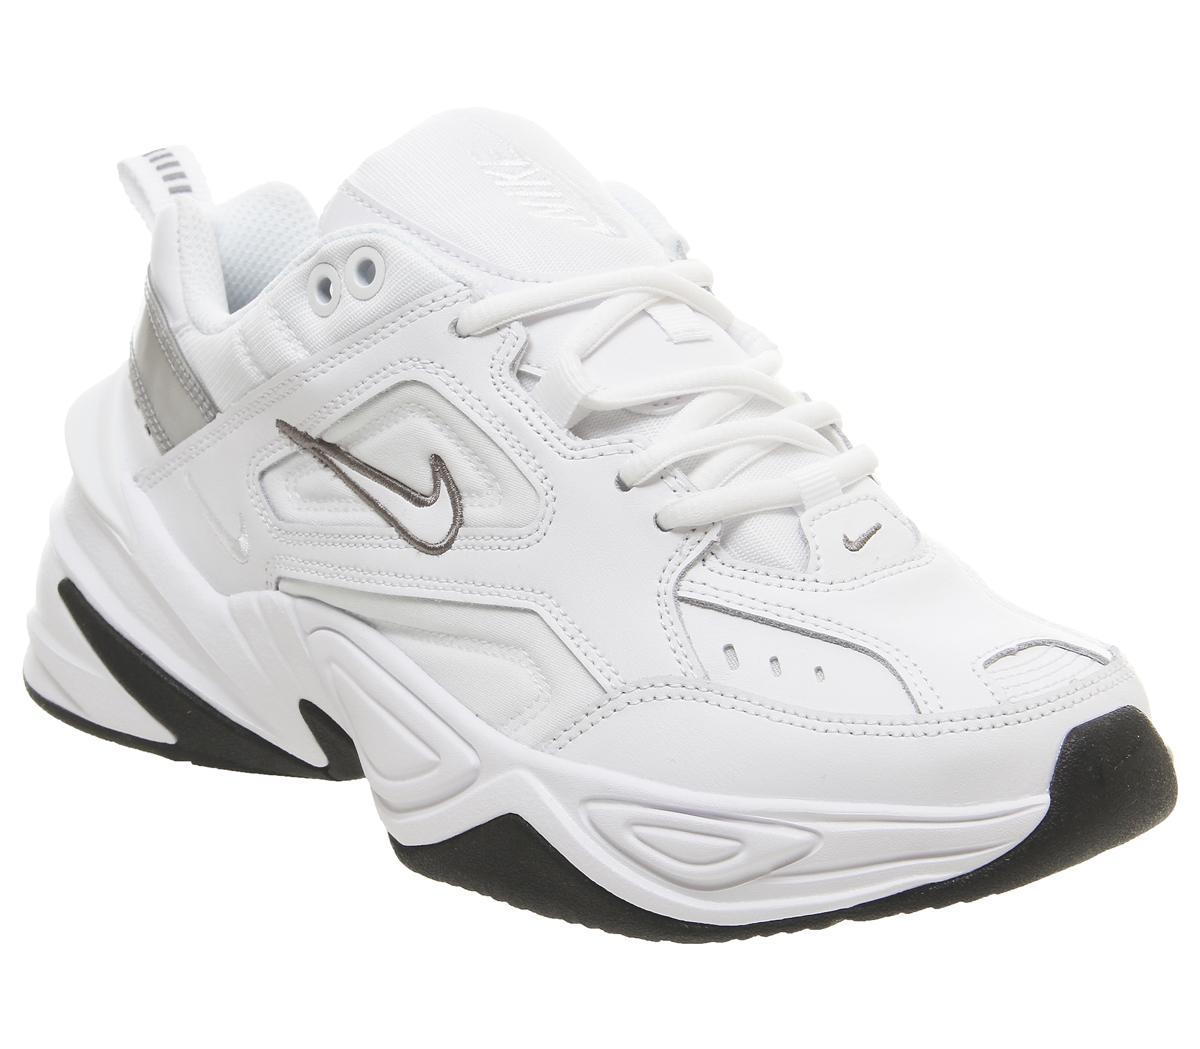 Nike M2k Tekno Trainers White Cool Grey